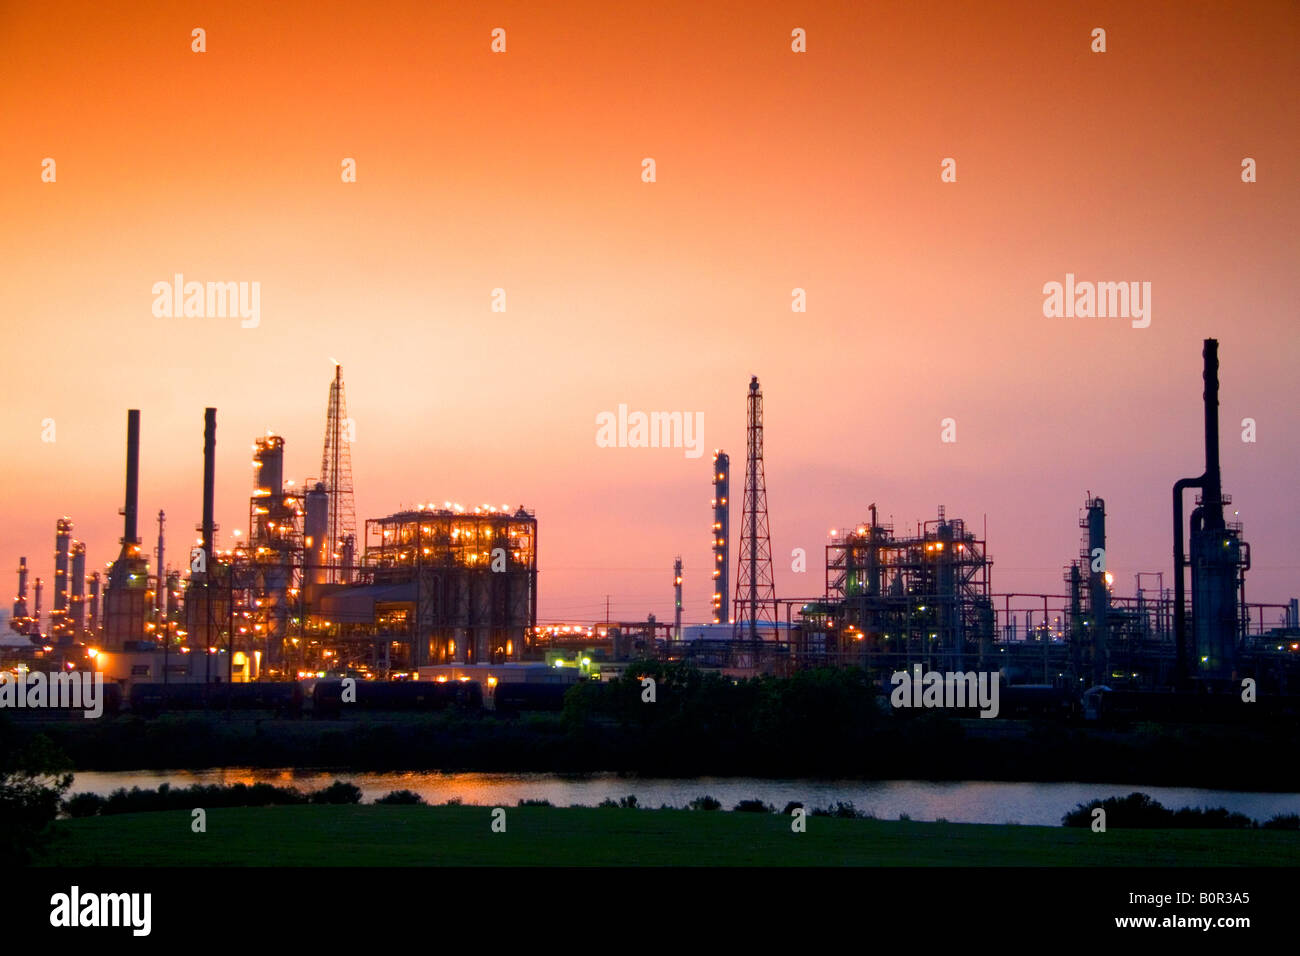 Refinery in Texas City Texas - Stock Image